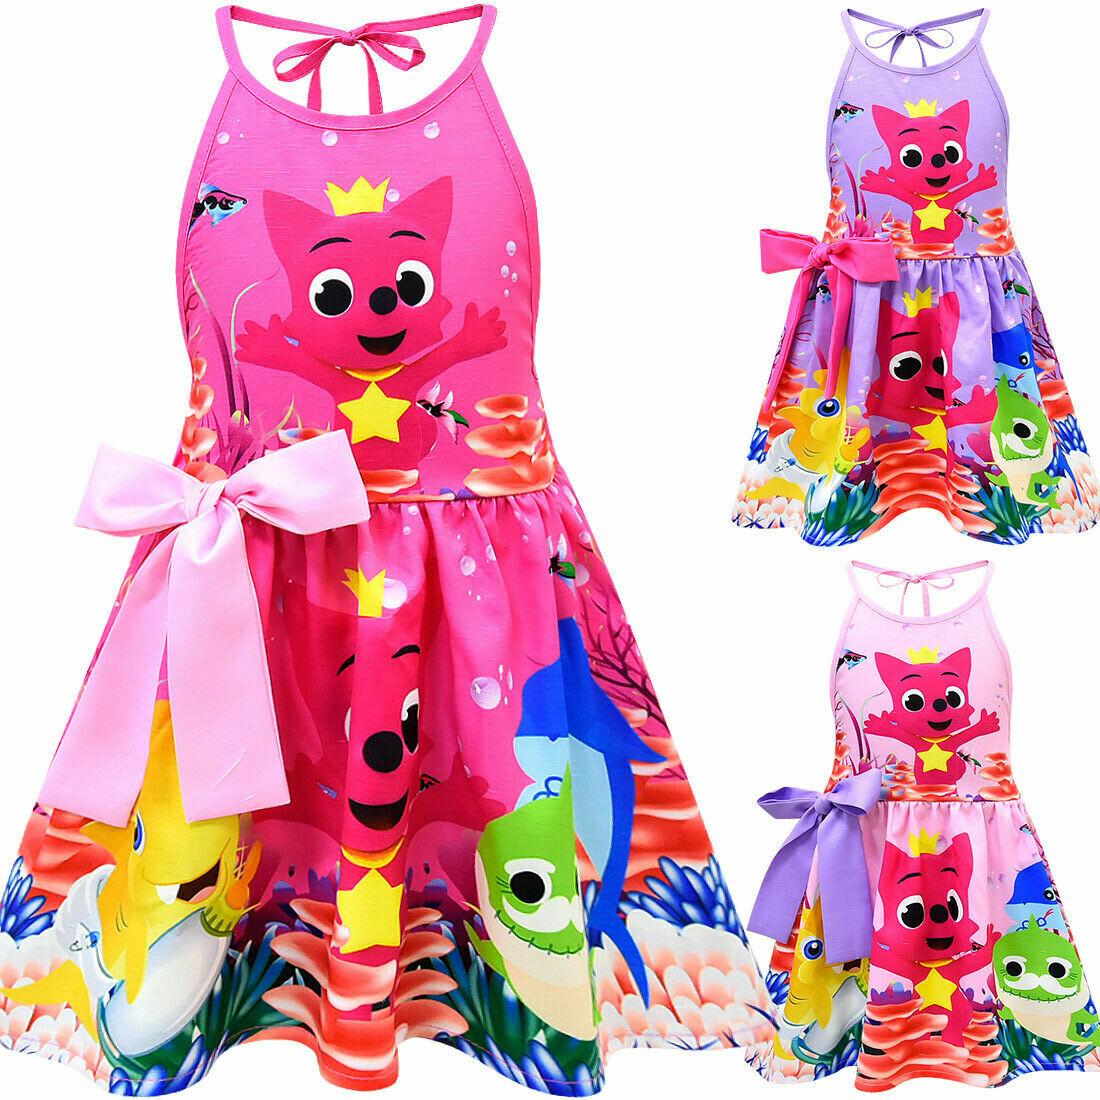 Girls Skater Dress Baby Shark Song Cute Party Birthday Chris